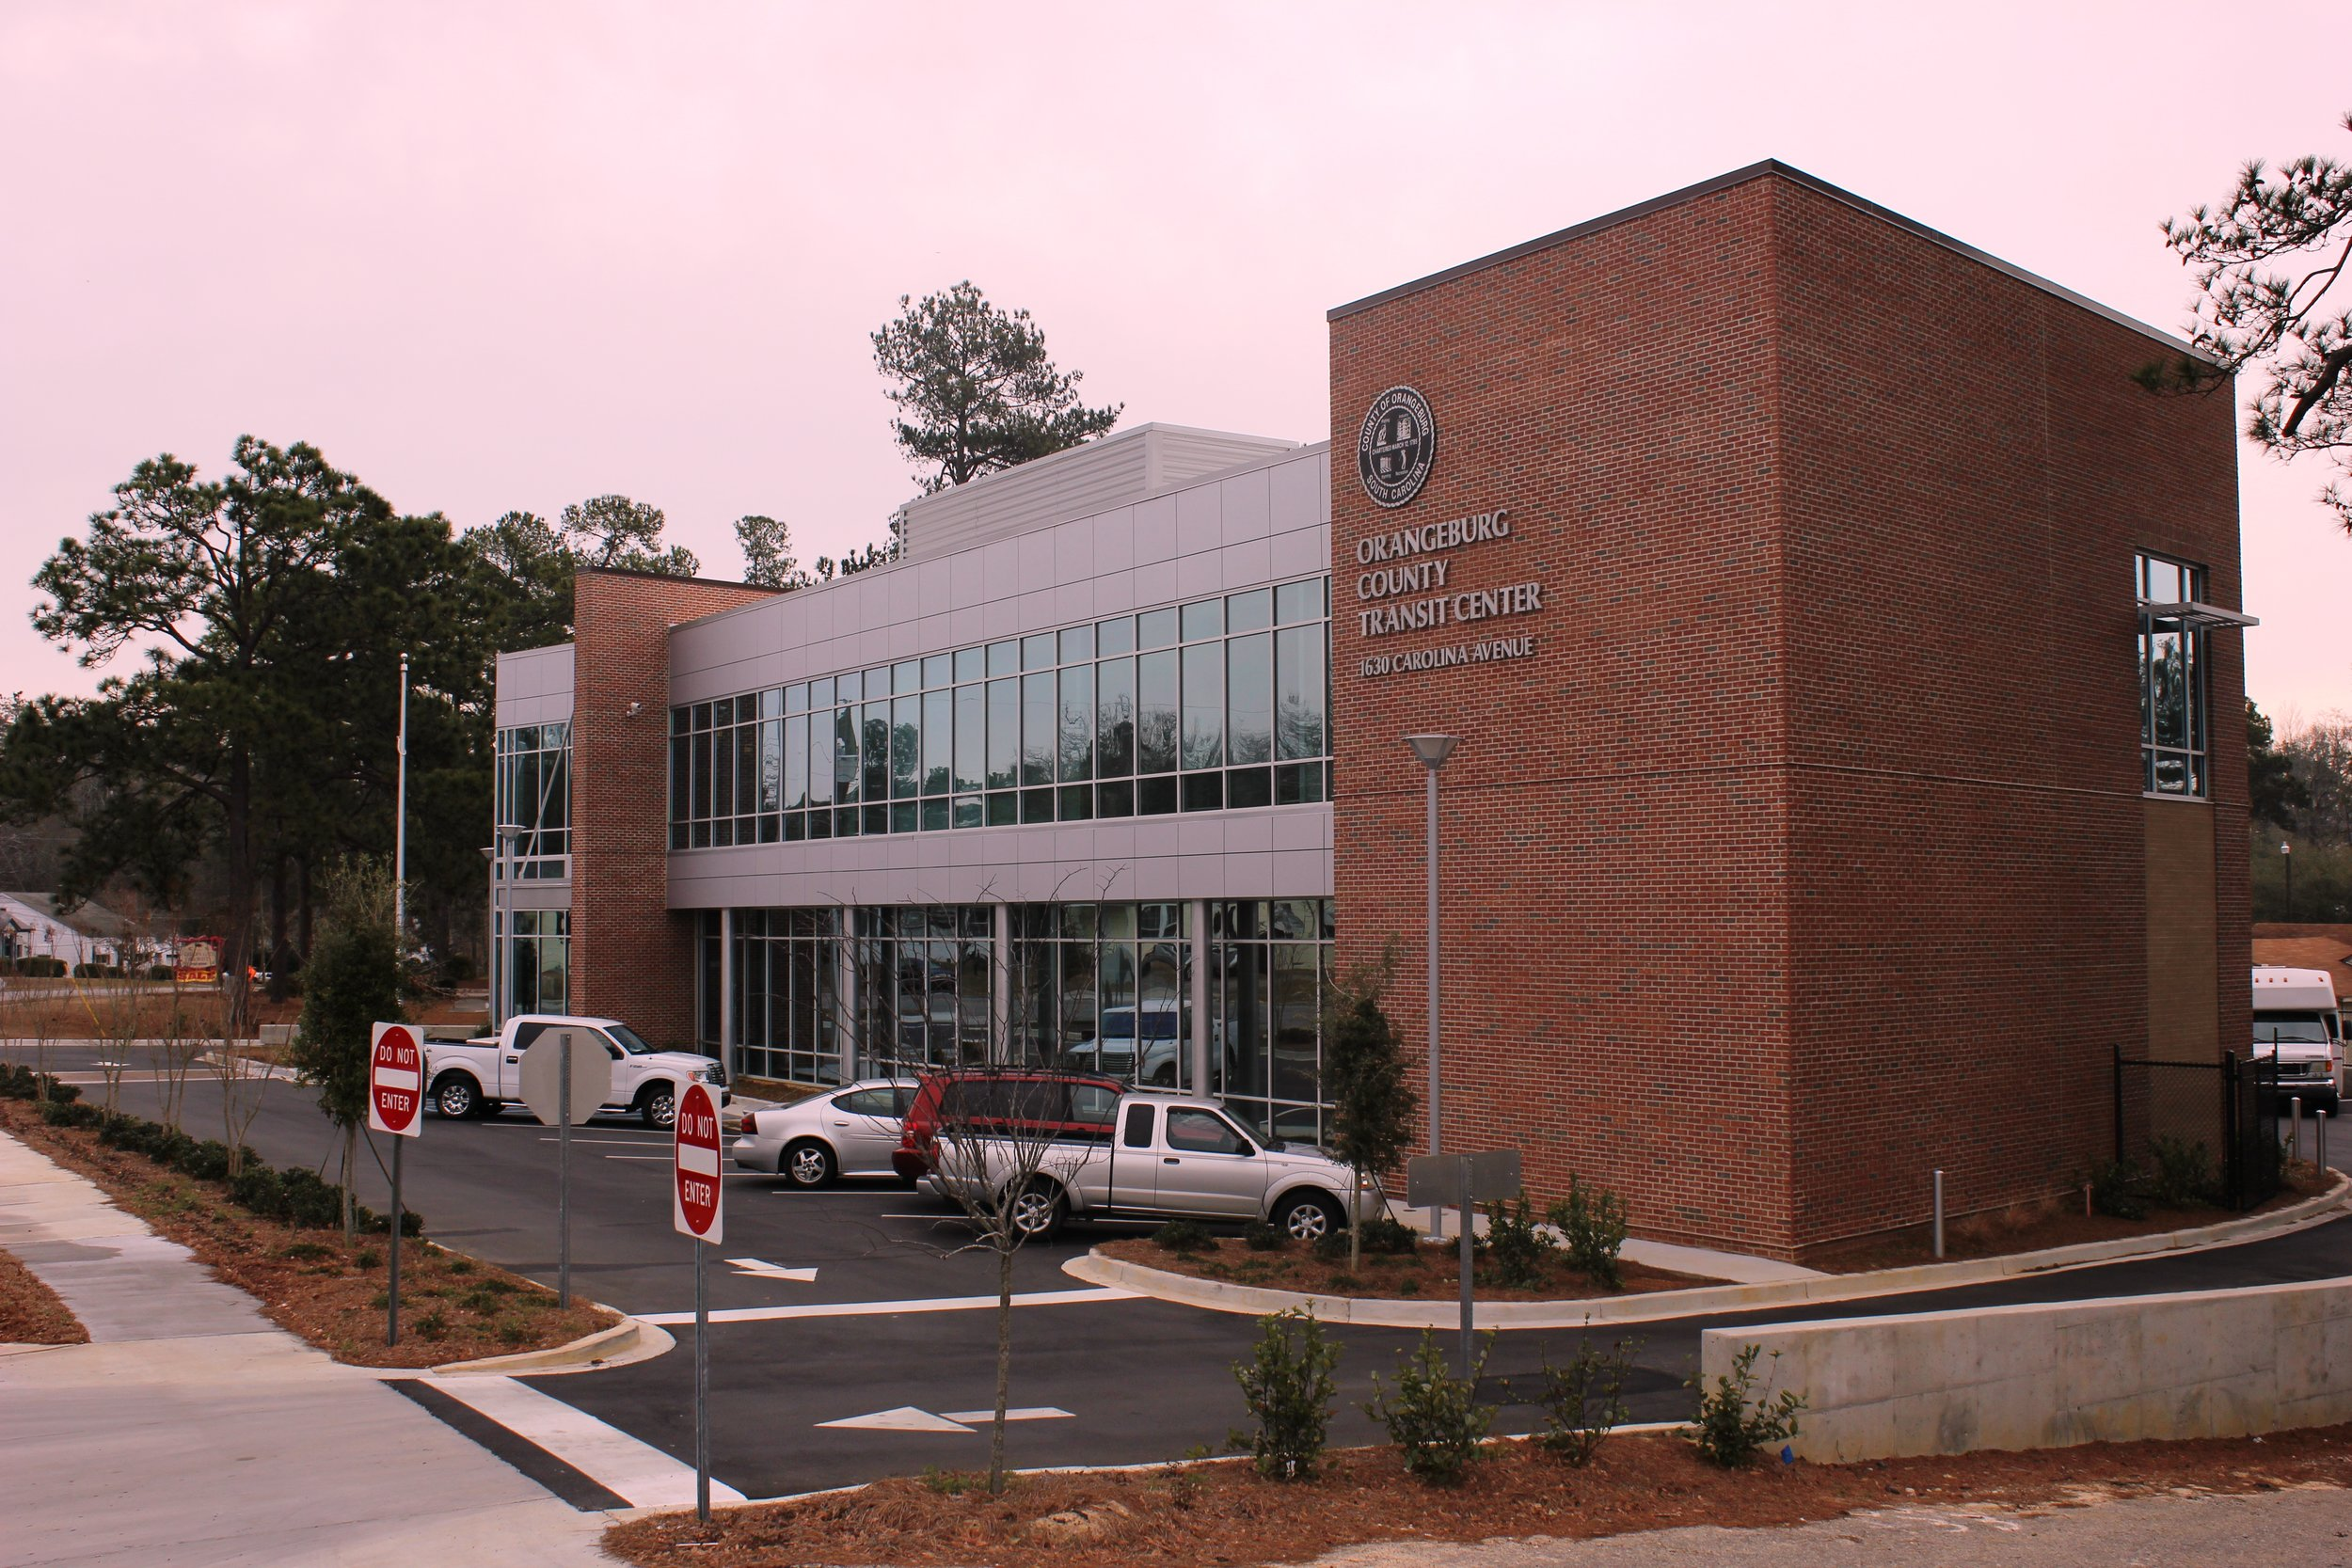 Orangeburg Transit Center